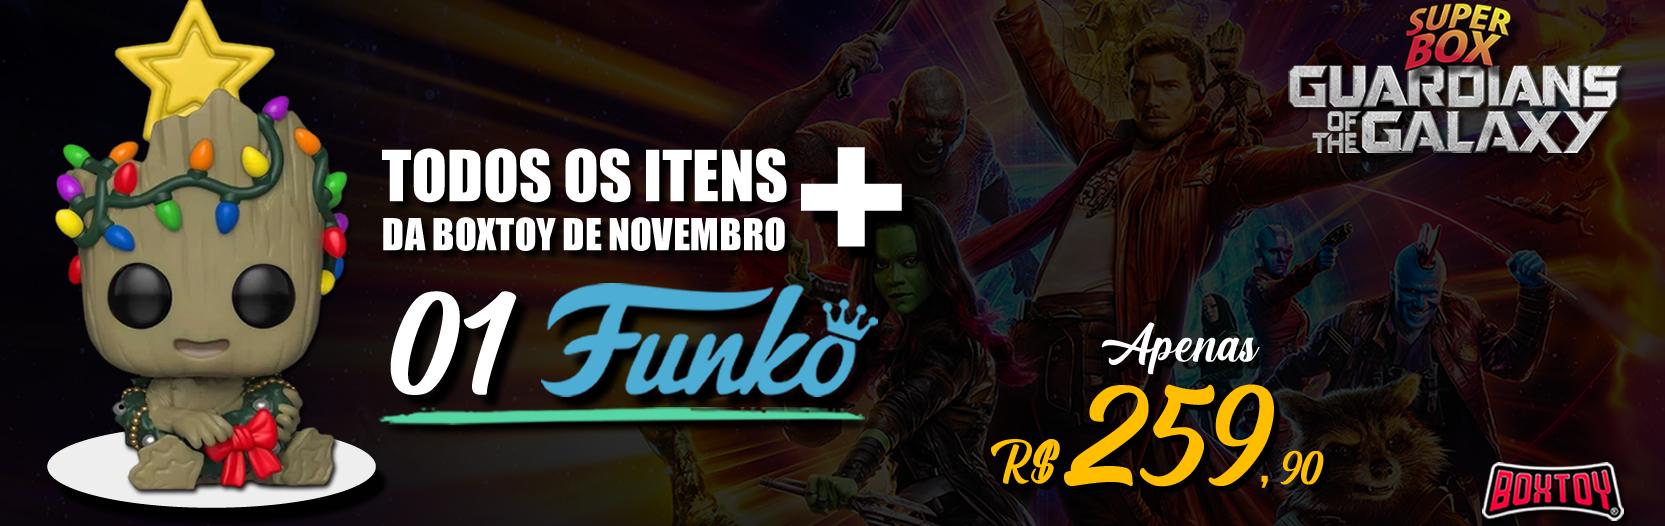 SuperBox Funko baby Groot